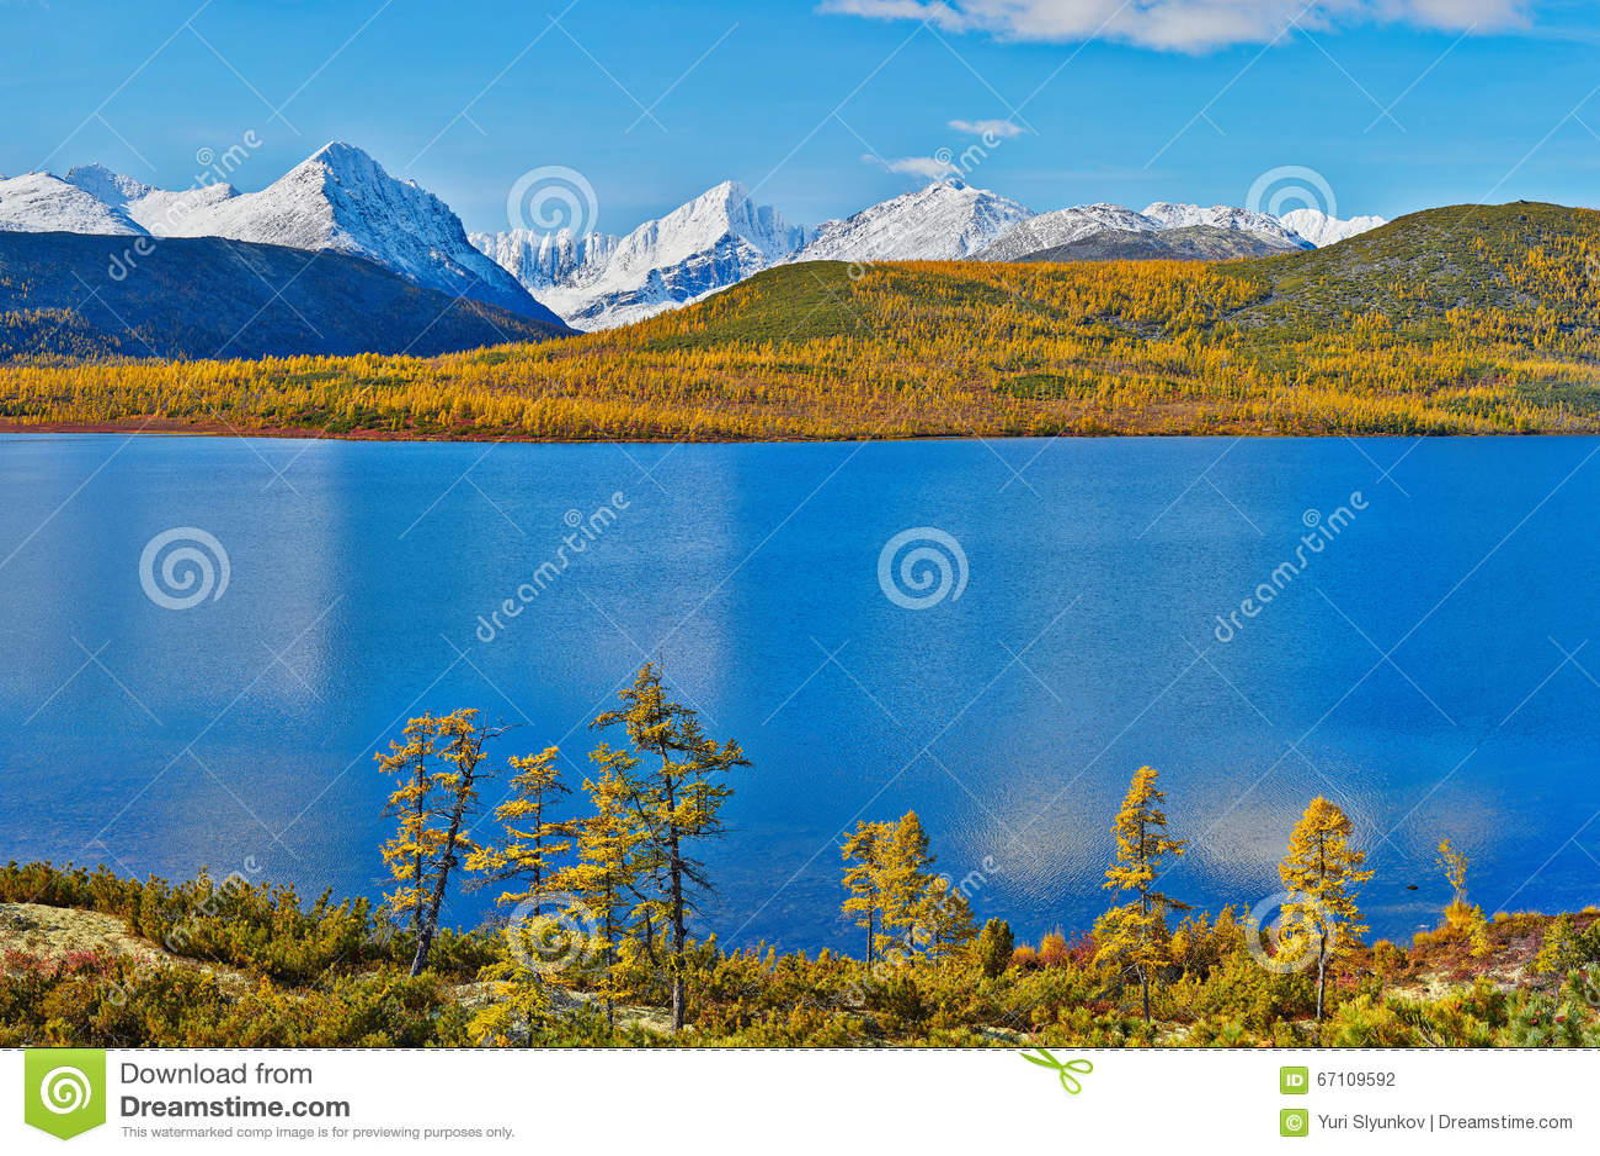 Autumn on Jack Londona s lake. Mountains in snow. Kolyma 2